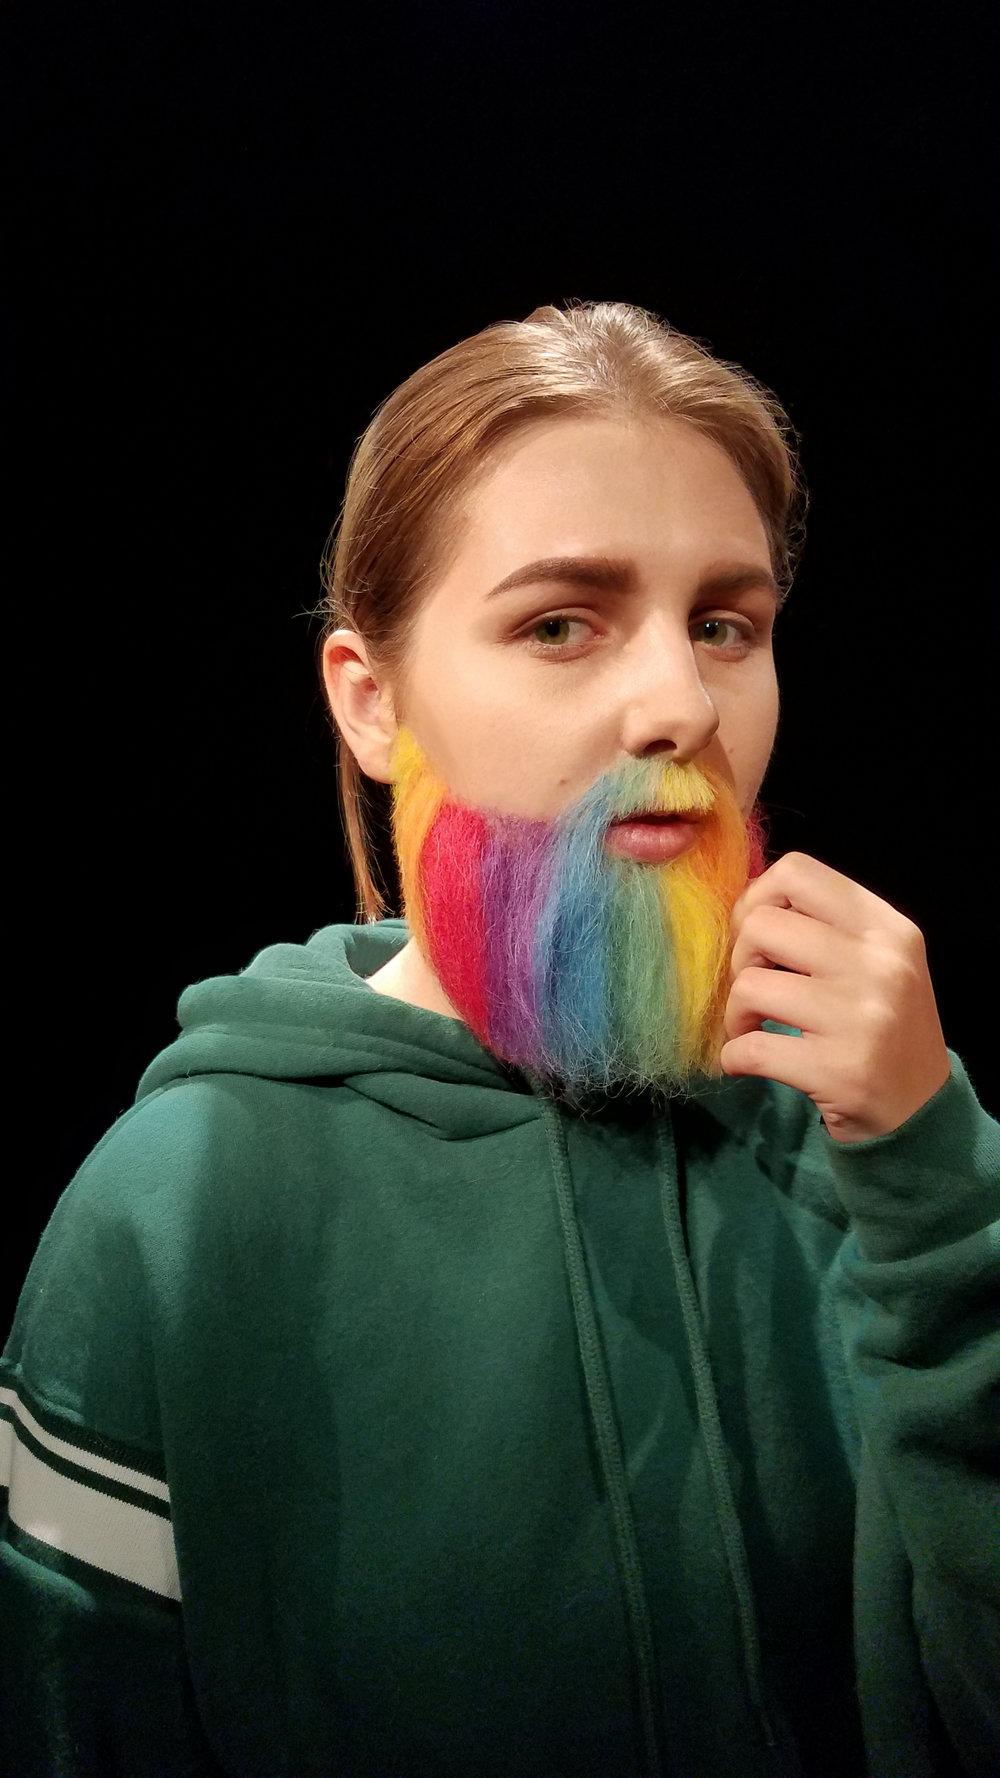 Rainbow Pride Beard